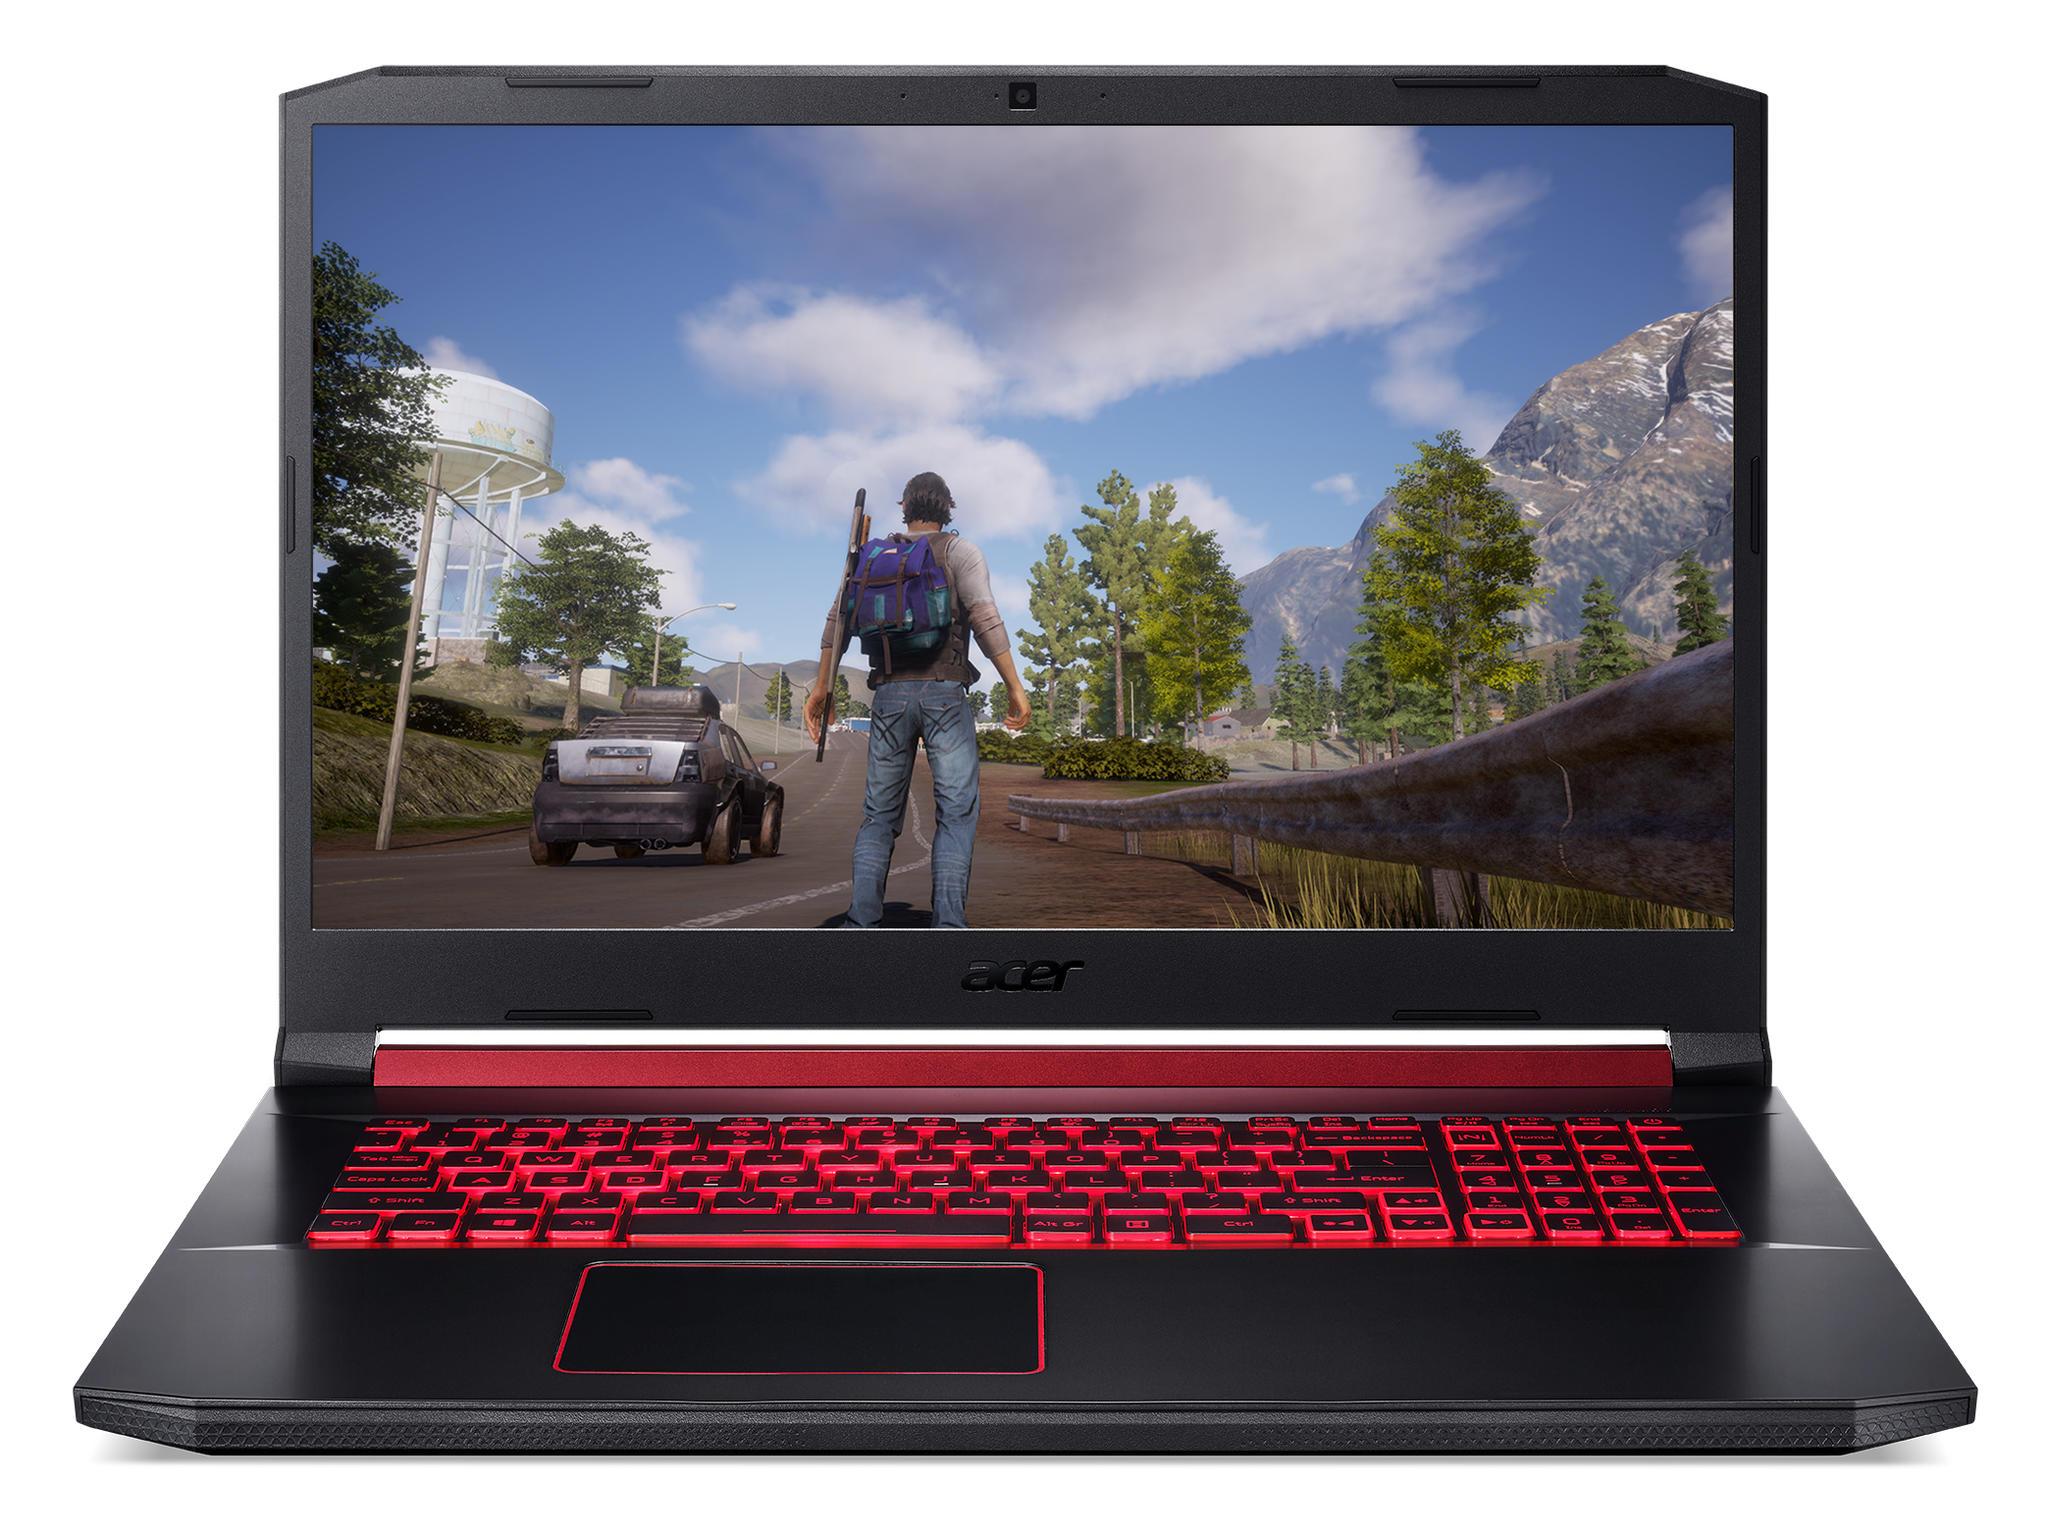 Acer Nitro 5 AN517-51-75X3 laptop